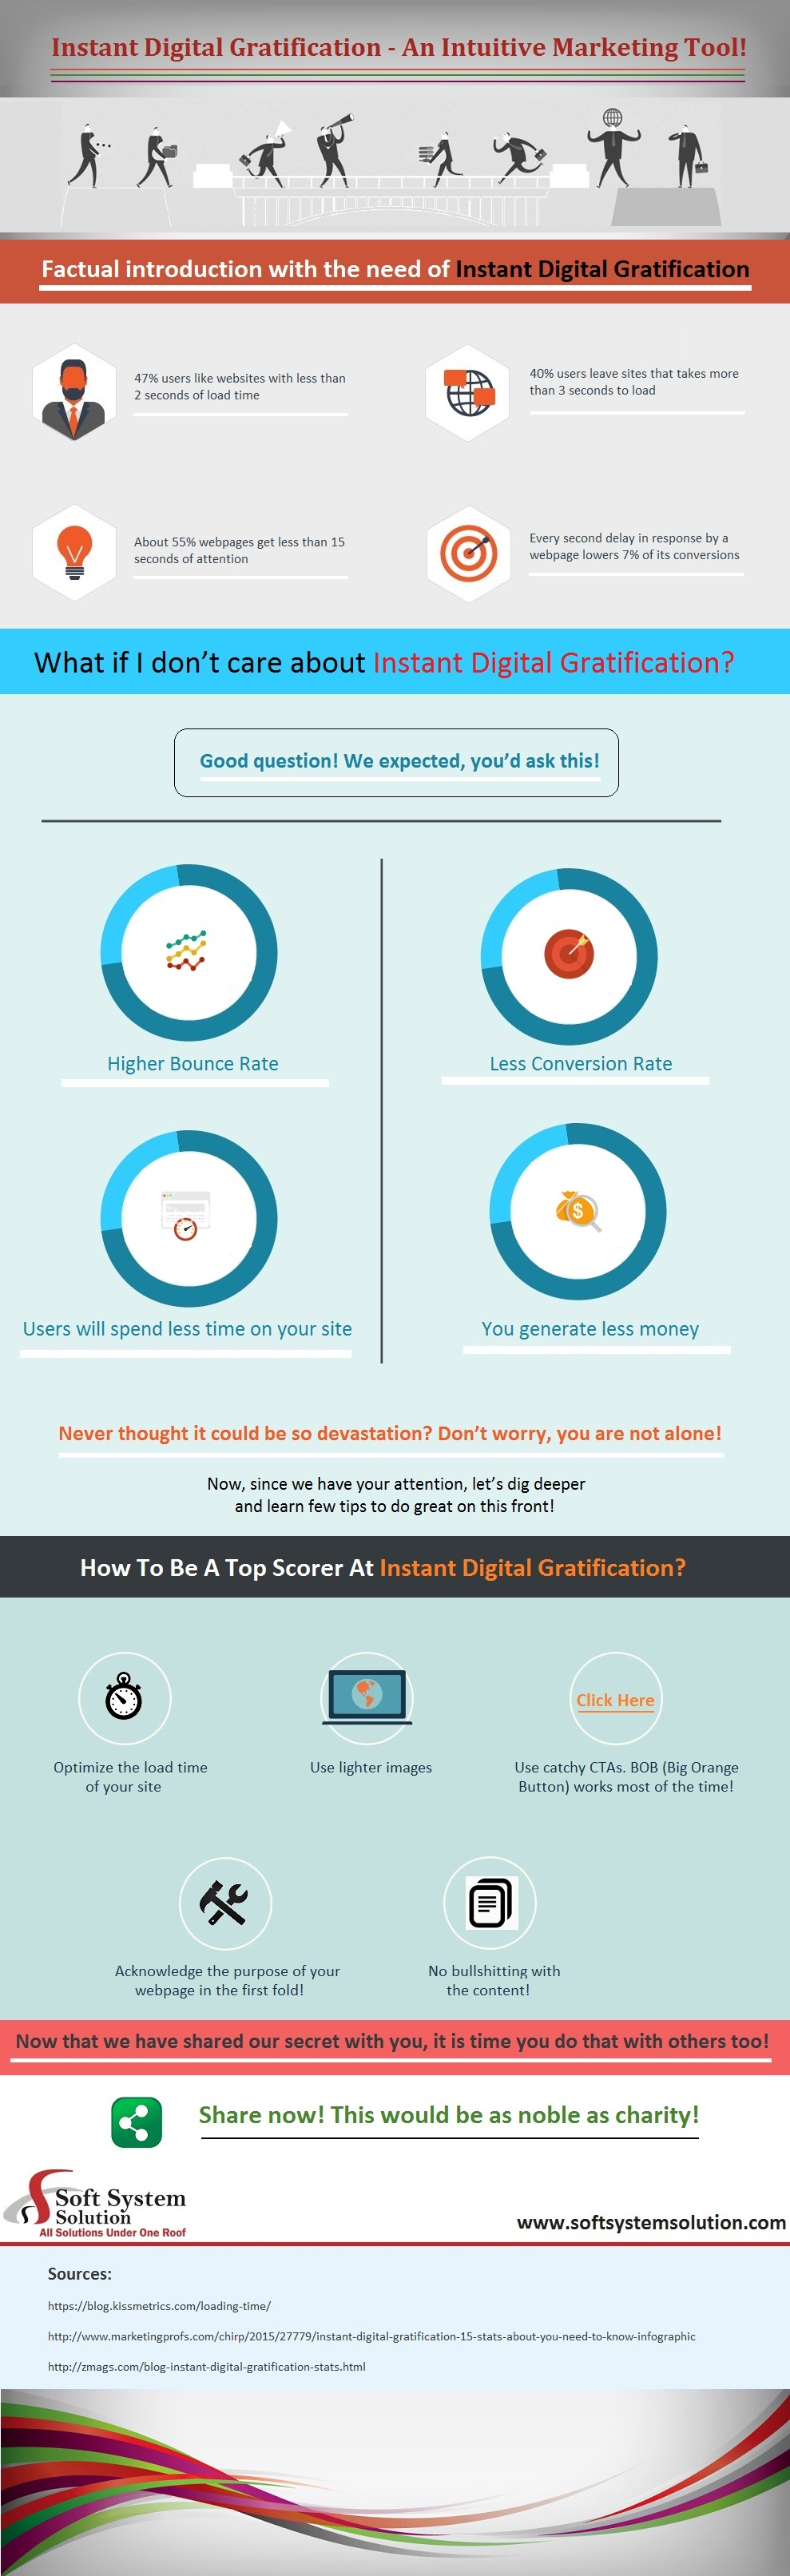 Instant Digital Gratification- An Intuitive Marketing Tool!